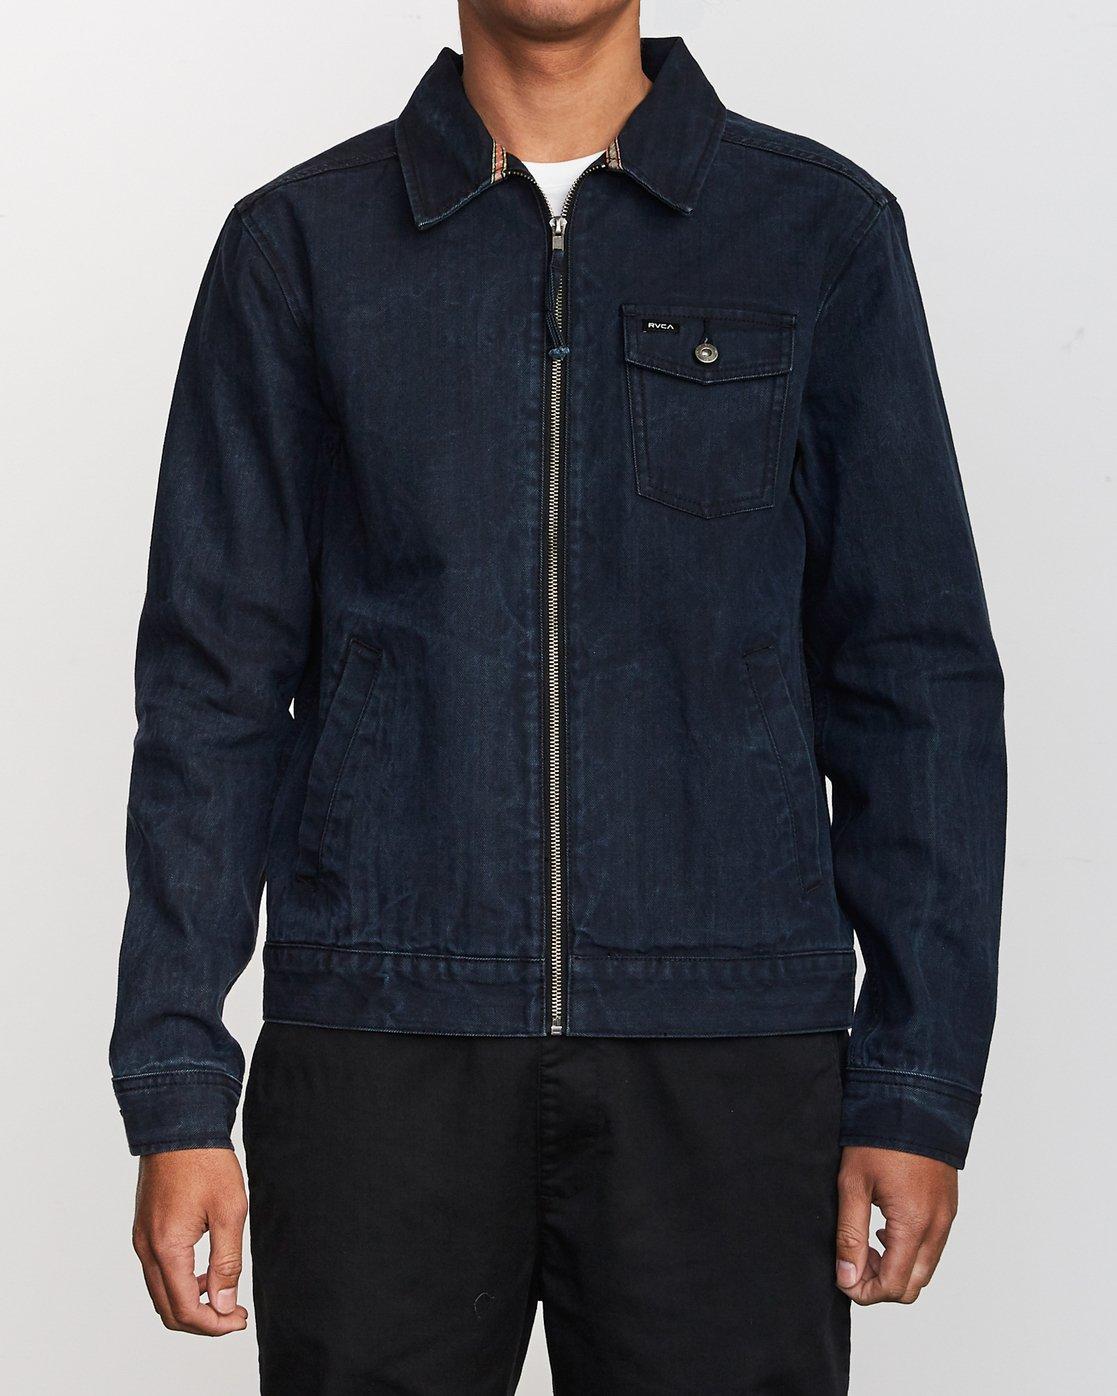 2 Hi - rade - Jeans-Jacke für Männer Blau Q1JKRFRVF9 RVCA